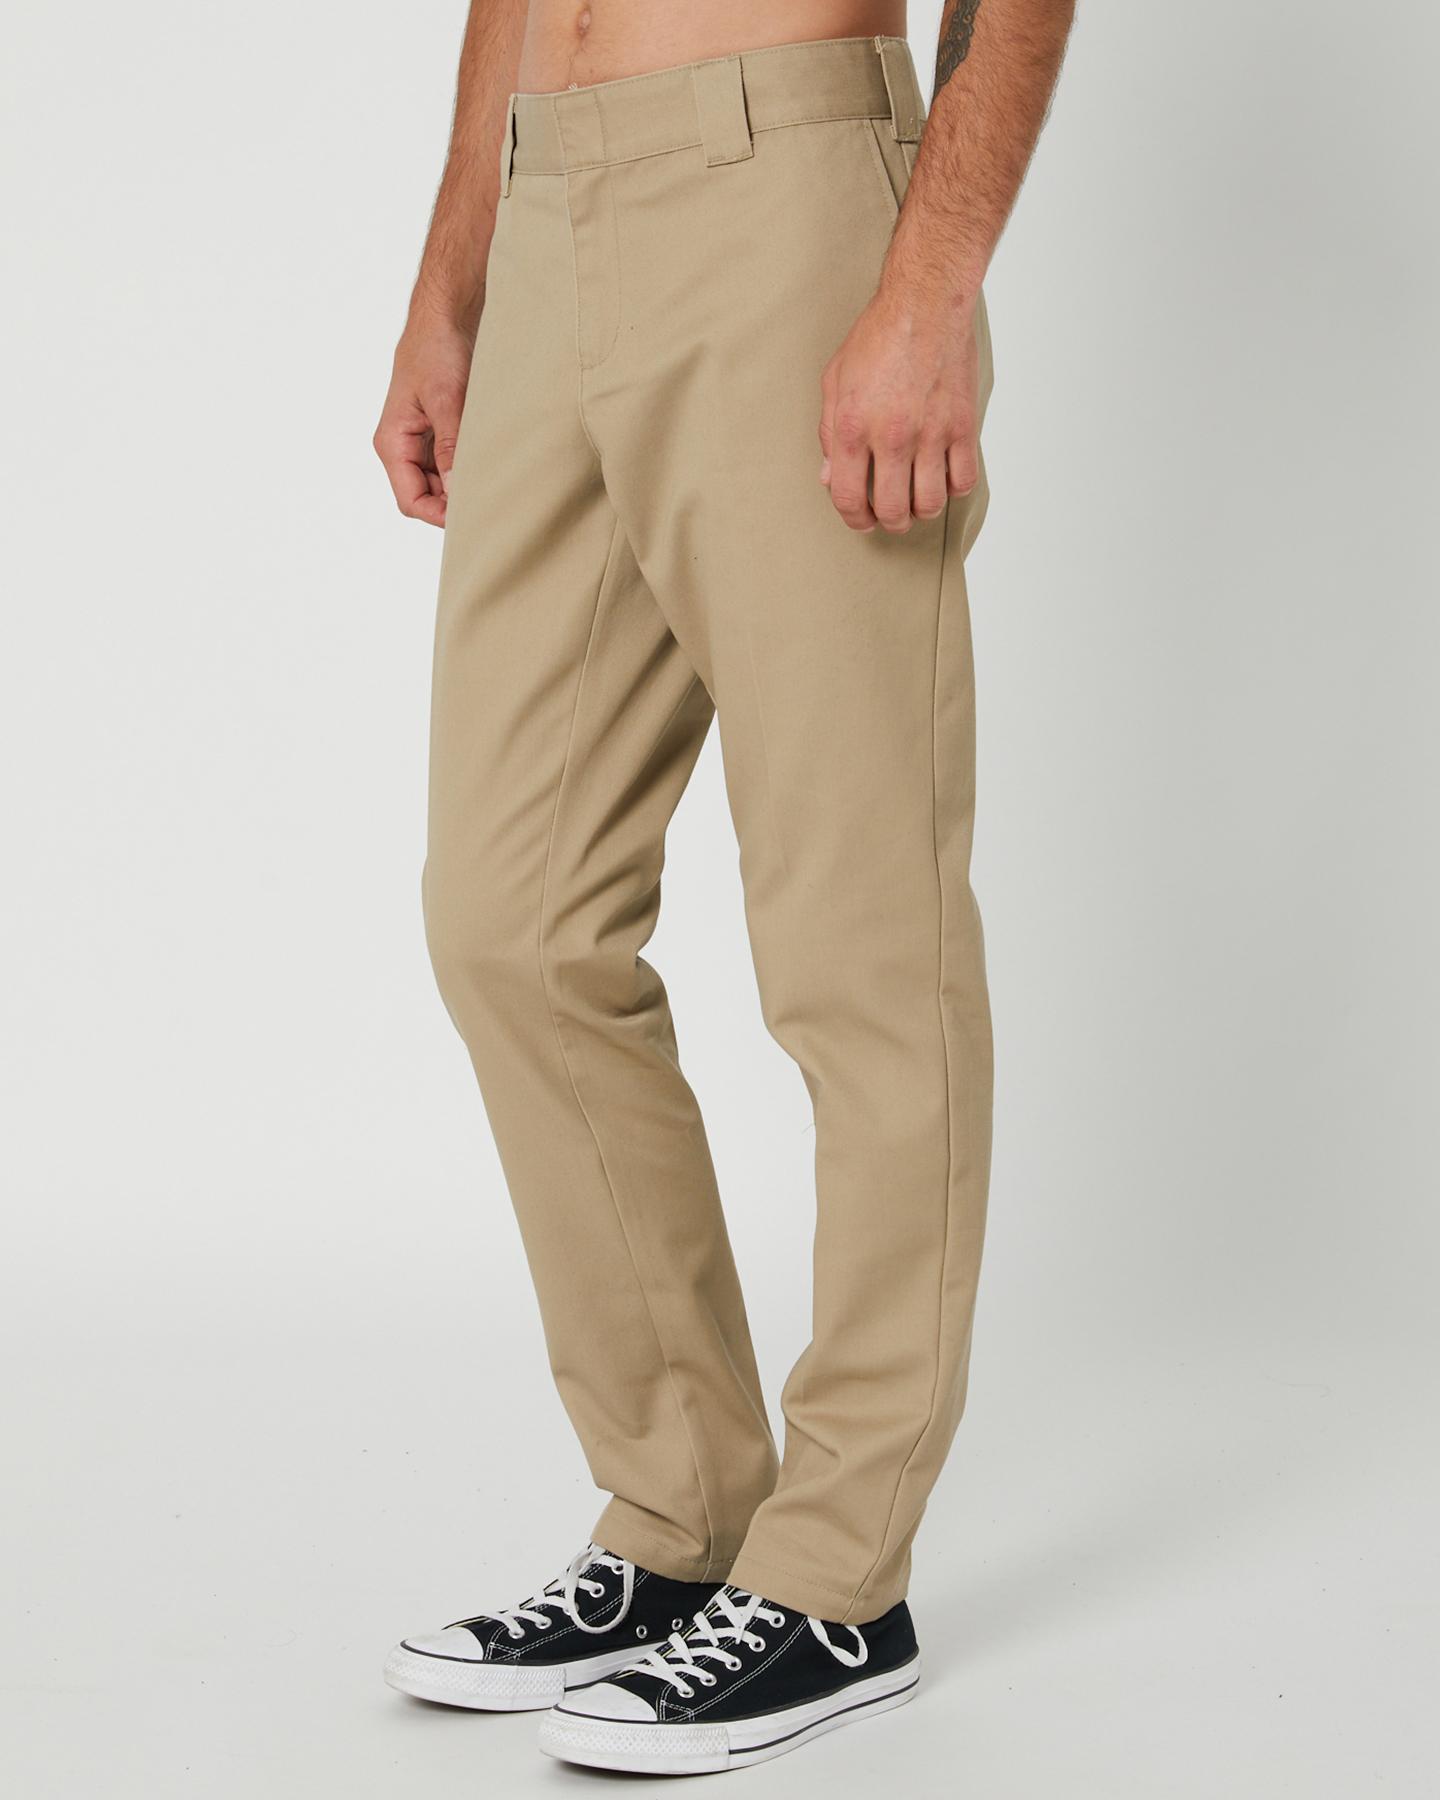 Dickies 872 Slim Fit Mens Work Pant Khaki Surfstitch